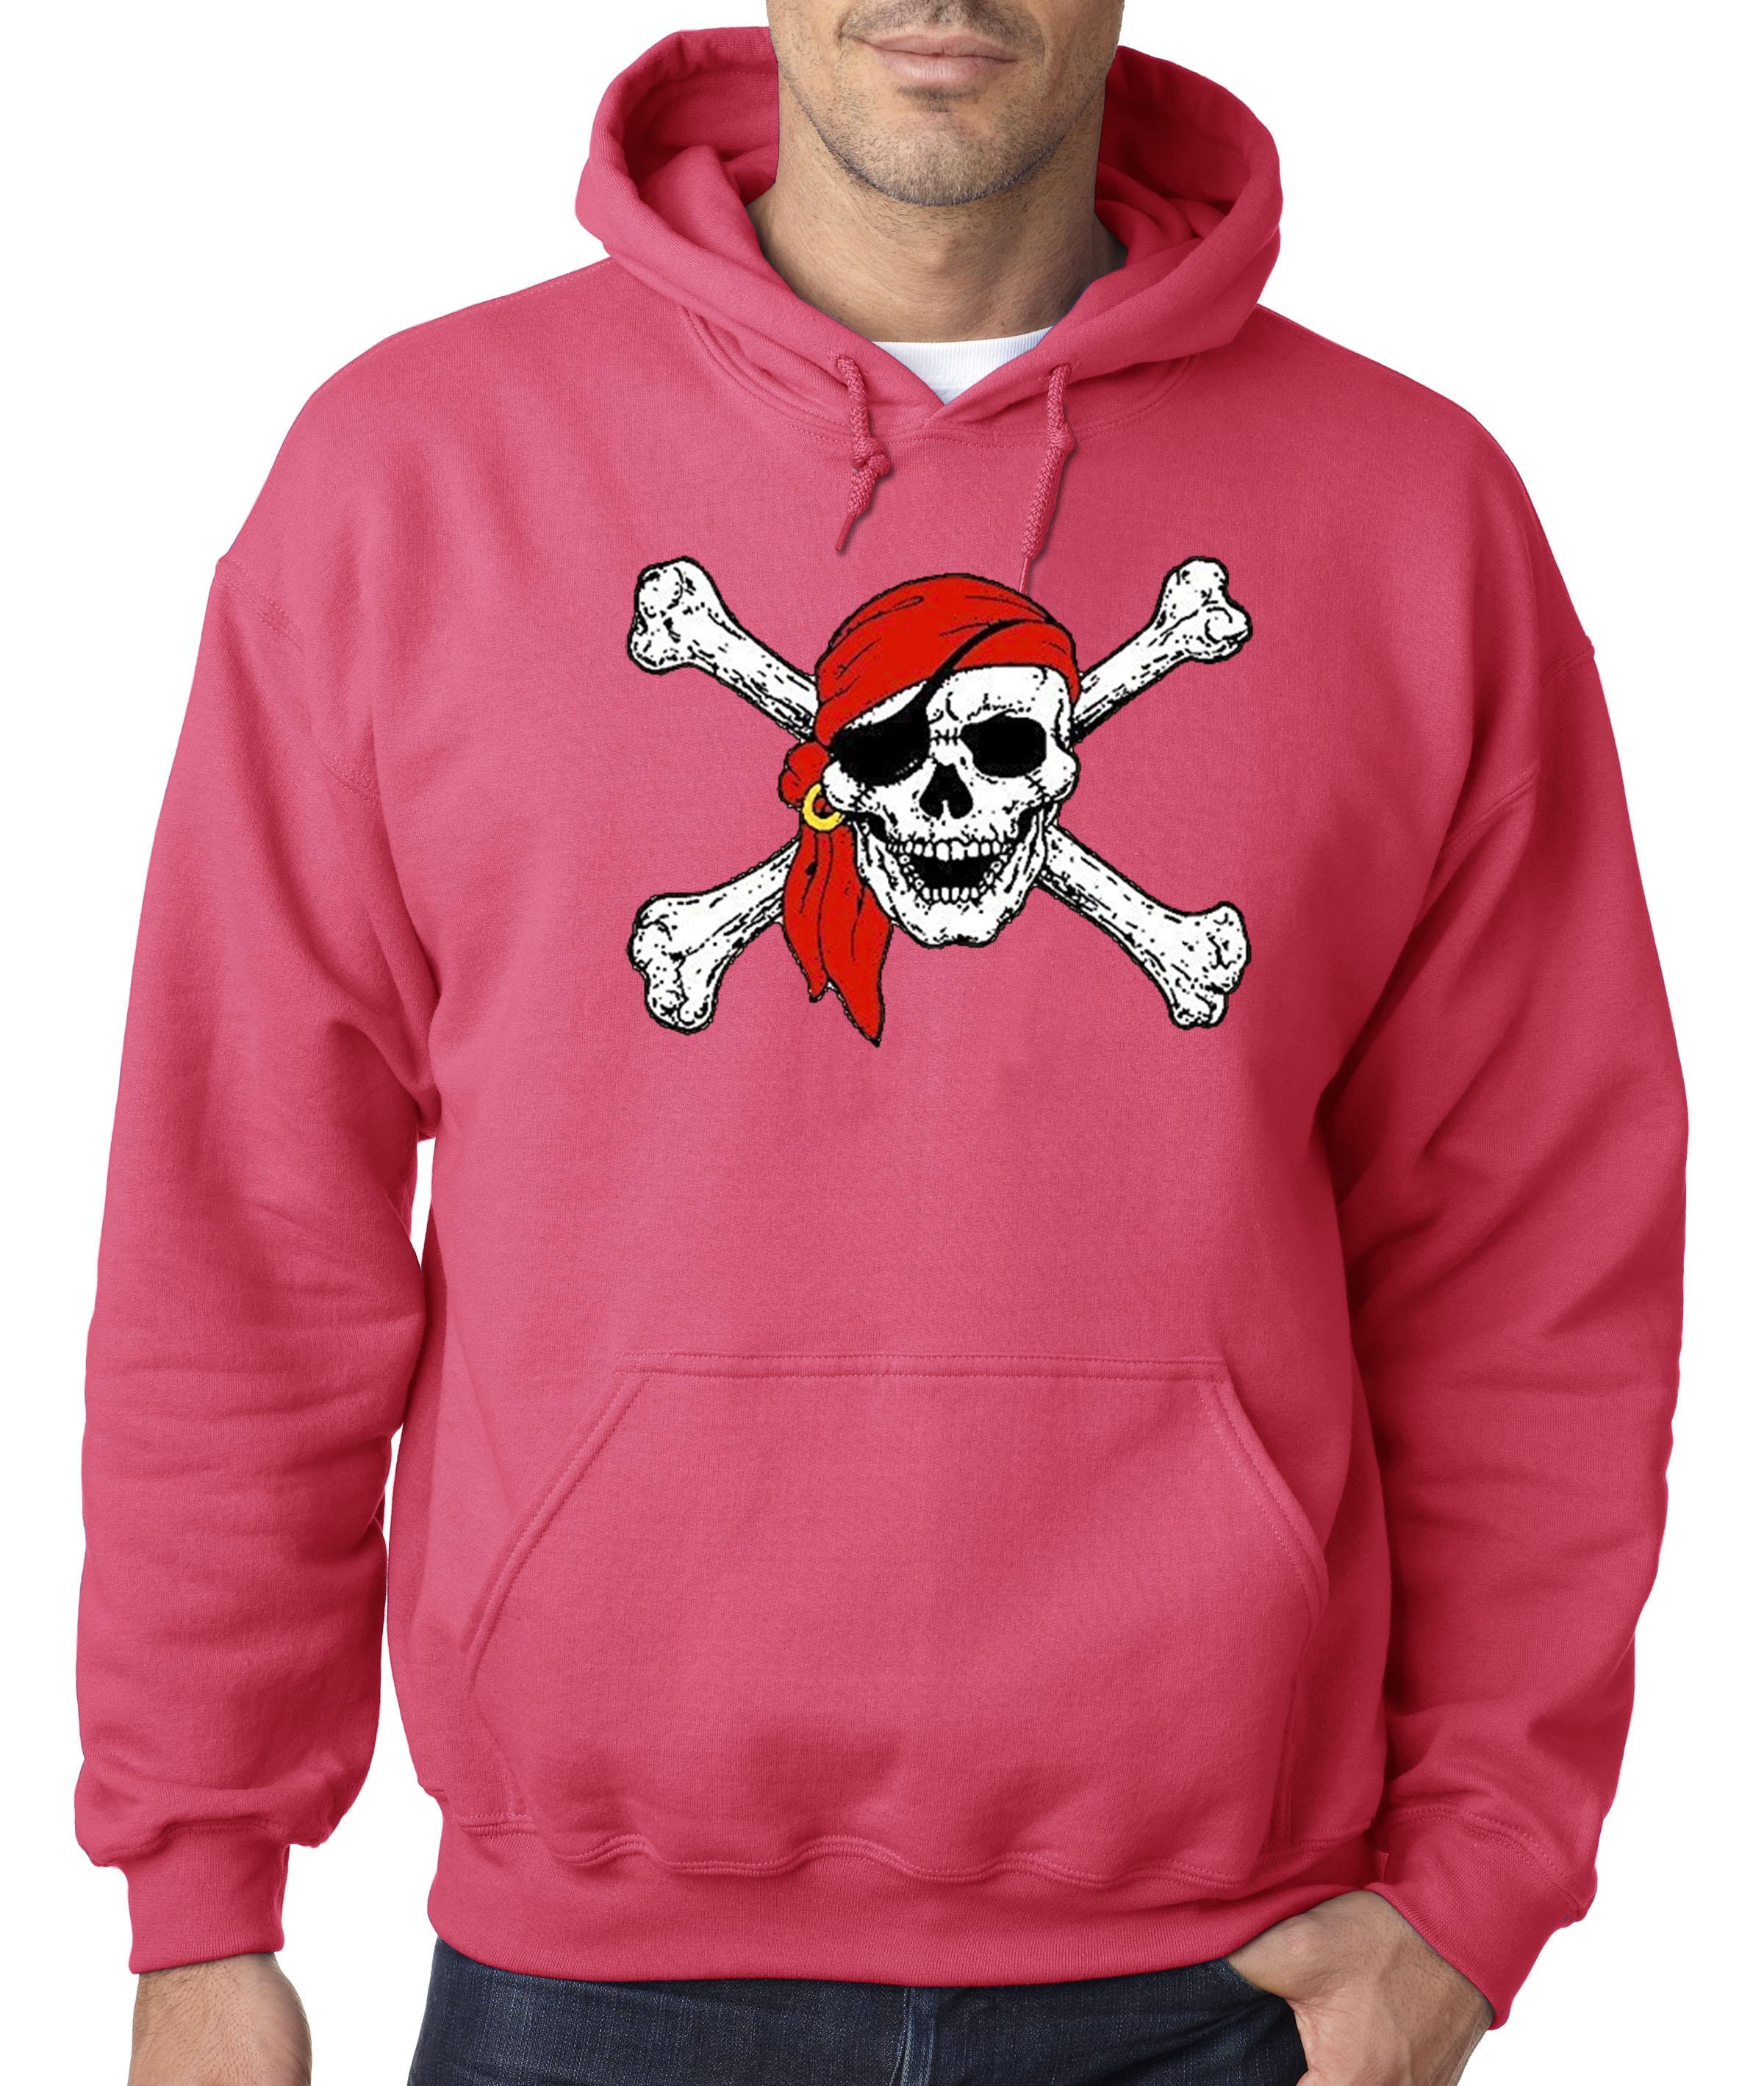 Jolly Roger Pirate Costume Black Adult Sweatshirt